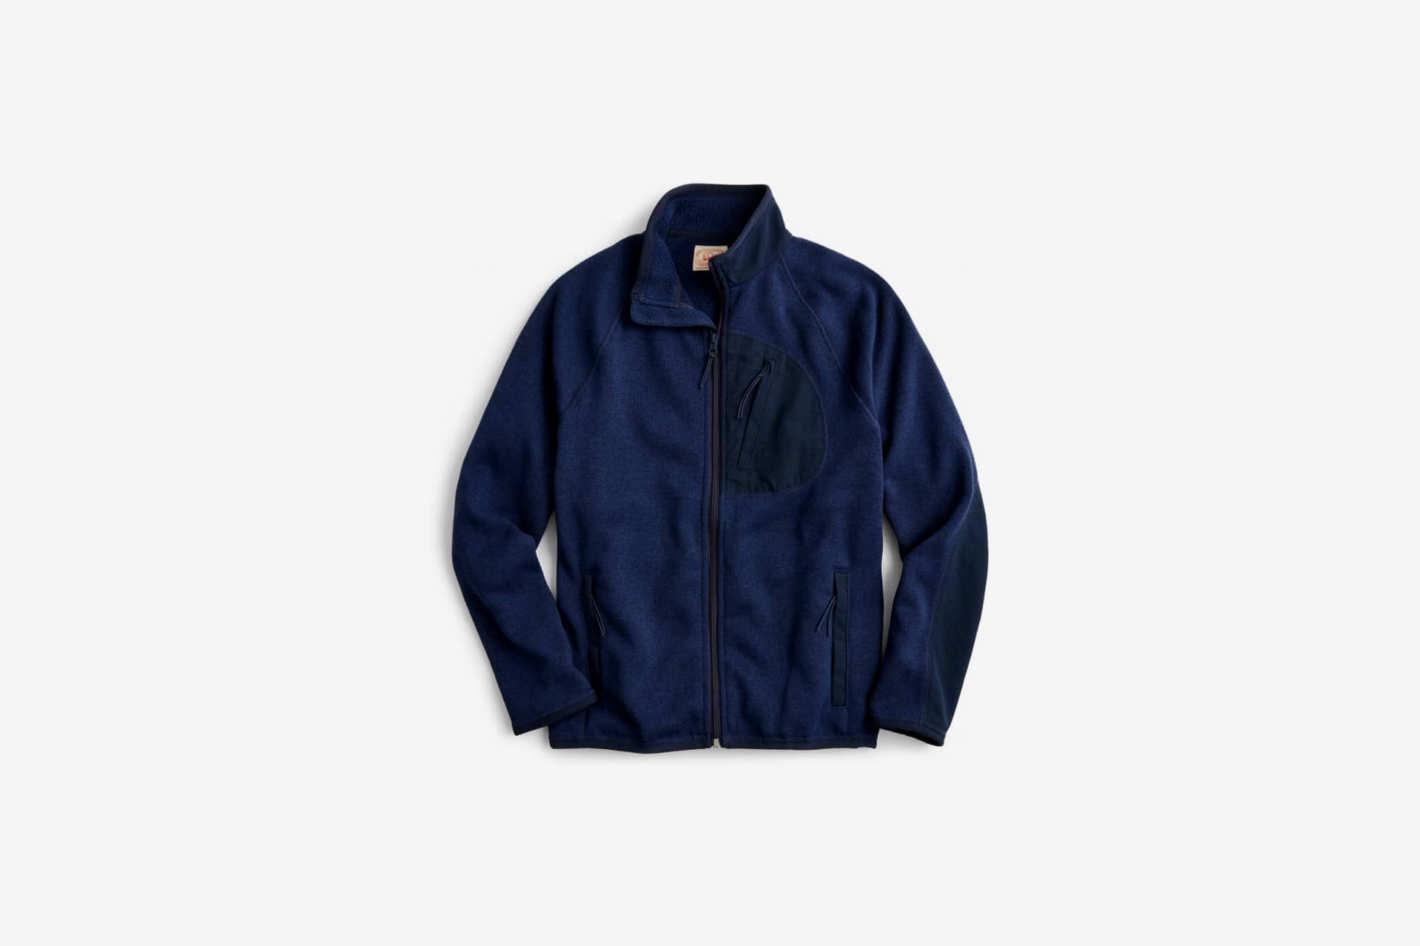 J. Crew Classic Fit Fleece Sweater Jacket